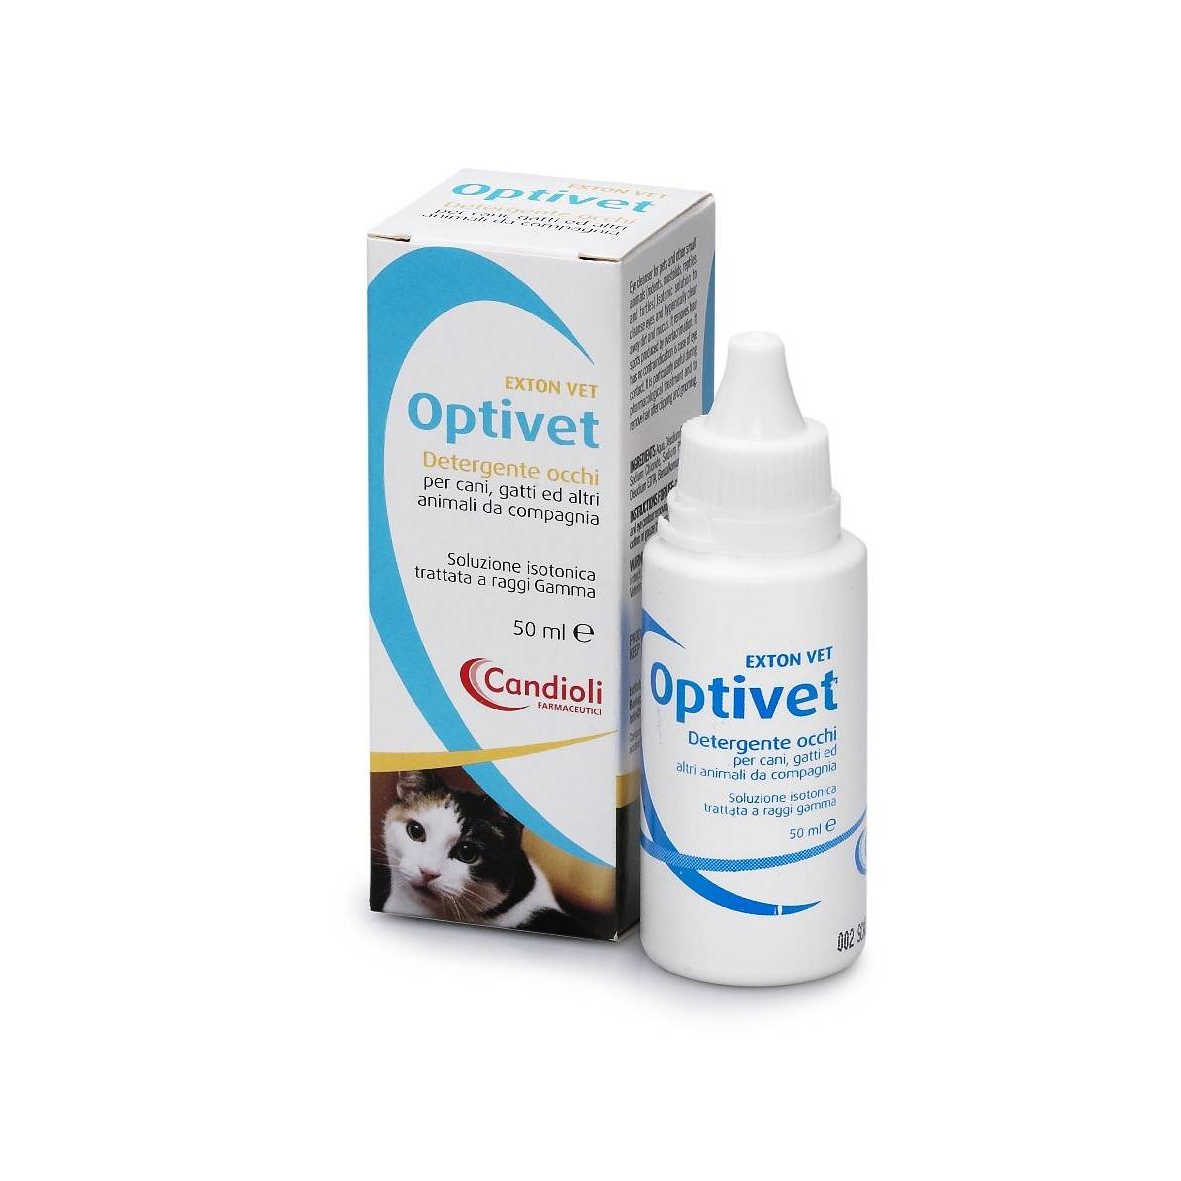 Candioli - Collirio Detergente Occhi - Optivet